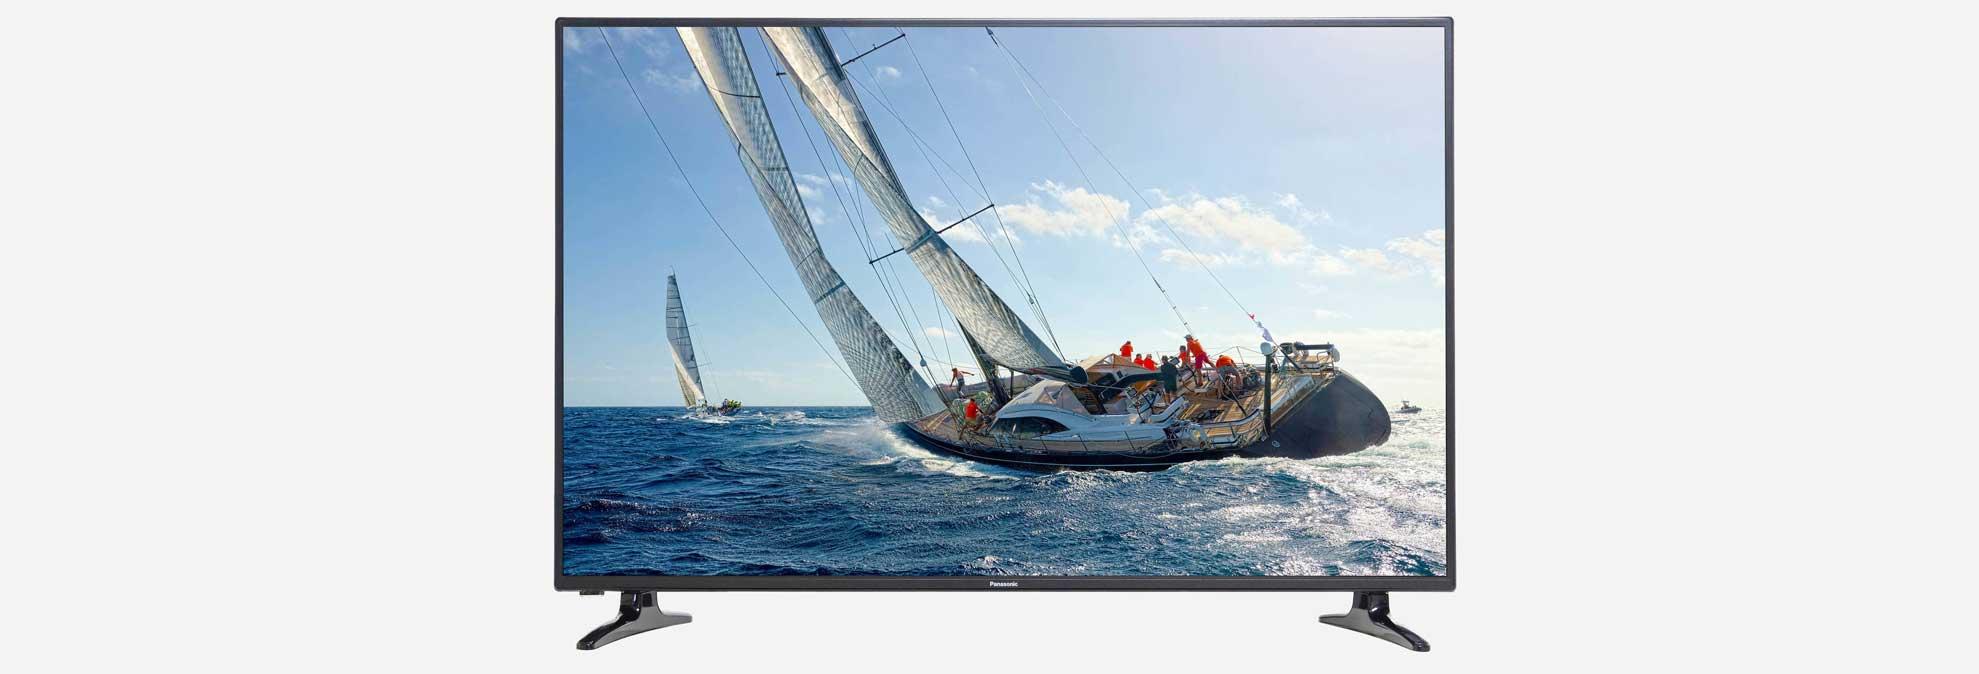 Tough Time Buying a Panasonic TV - Consumer Reports